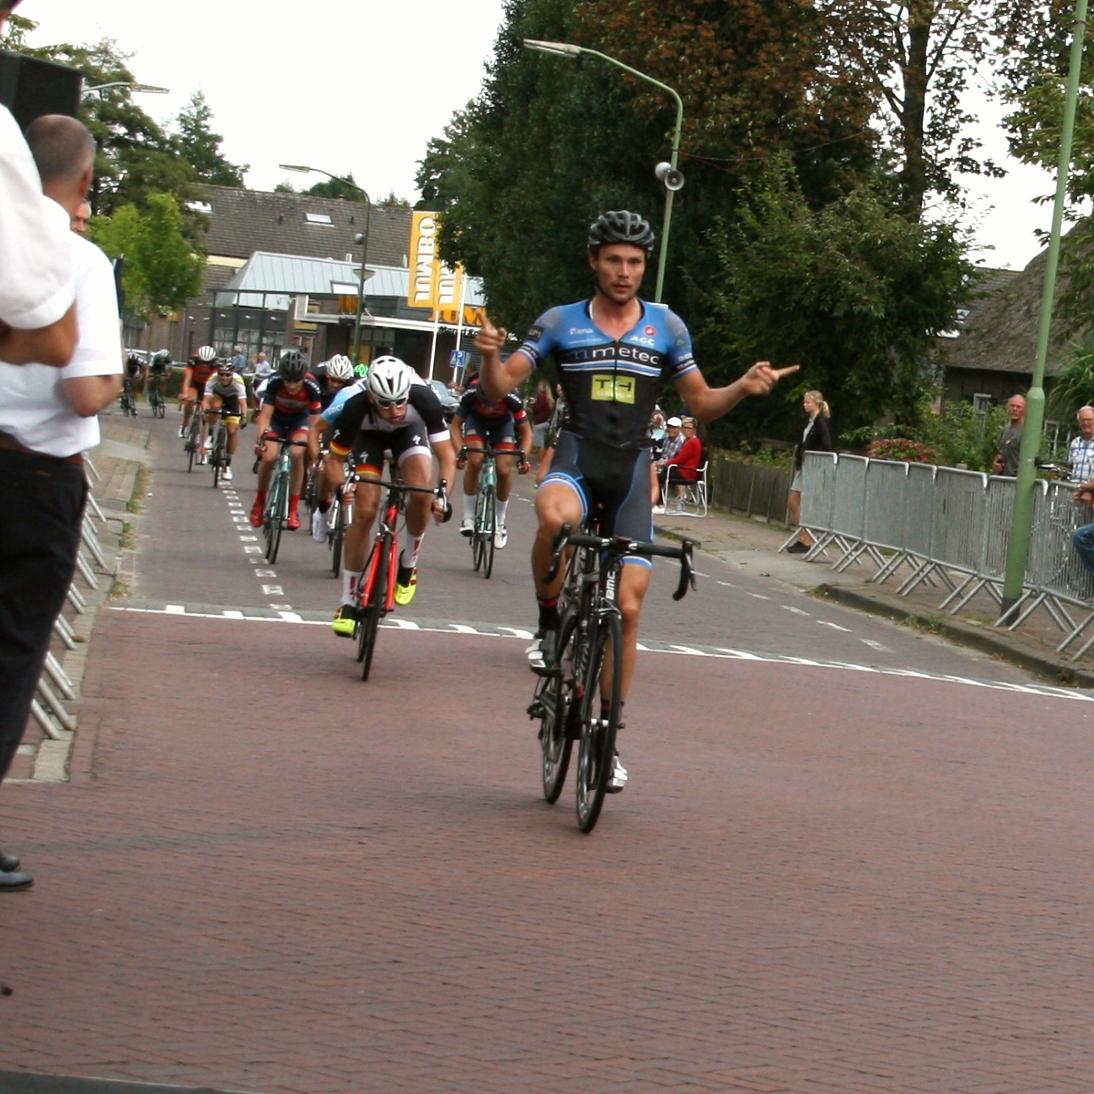 eb-johim-ariesen-winnaar-ronde-v-hank-2016